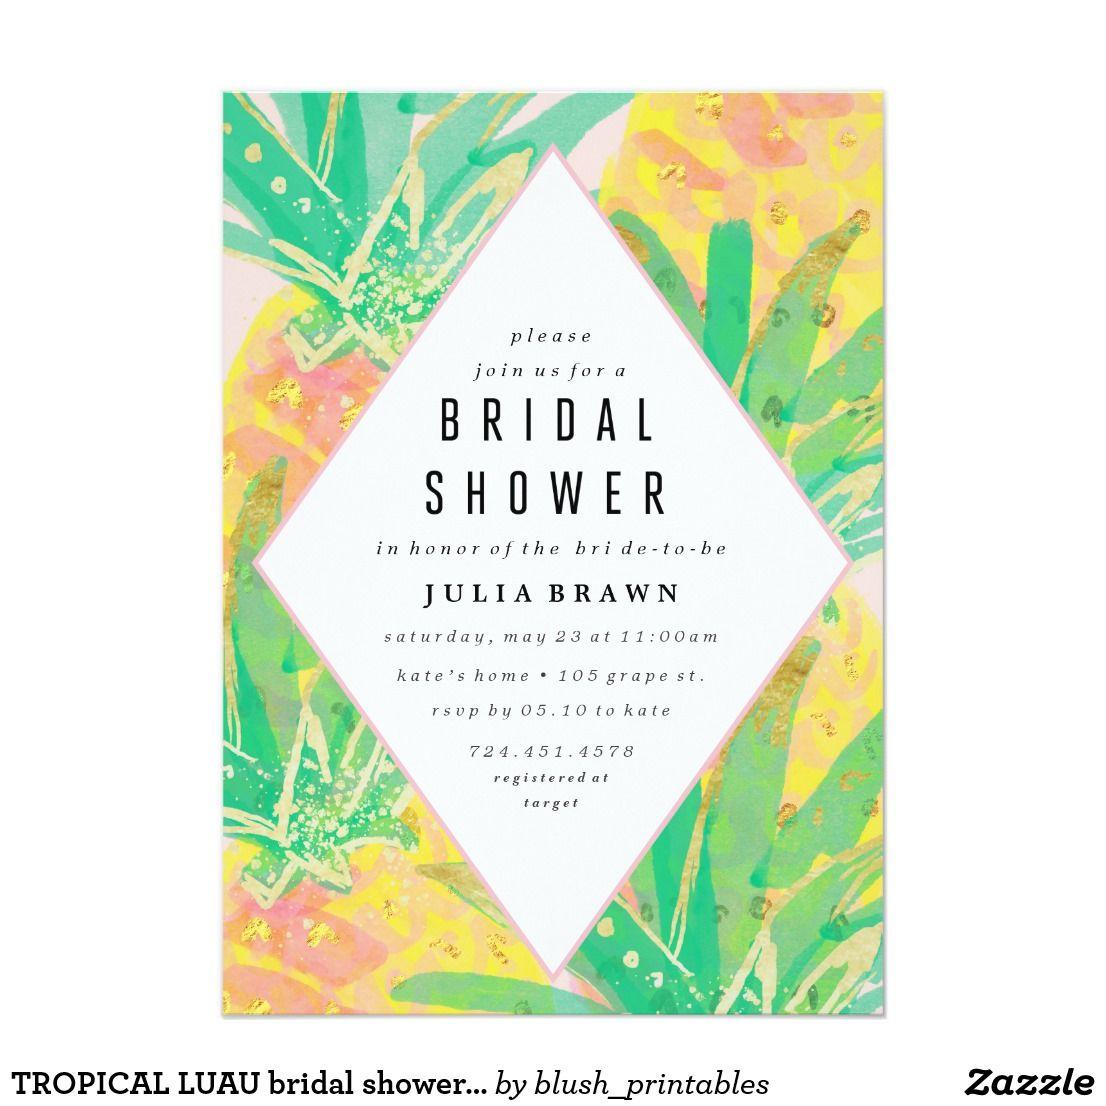 Tropical luau bridal shower invitation bridal showers shower tropical luau bridal shower invitation filmwisefo